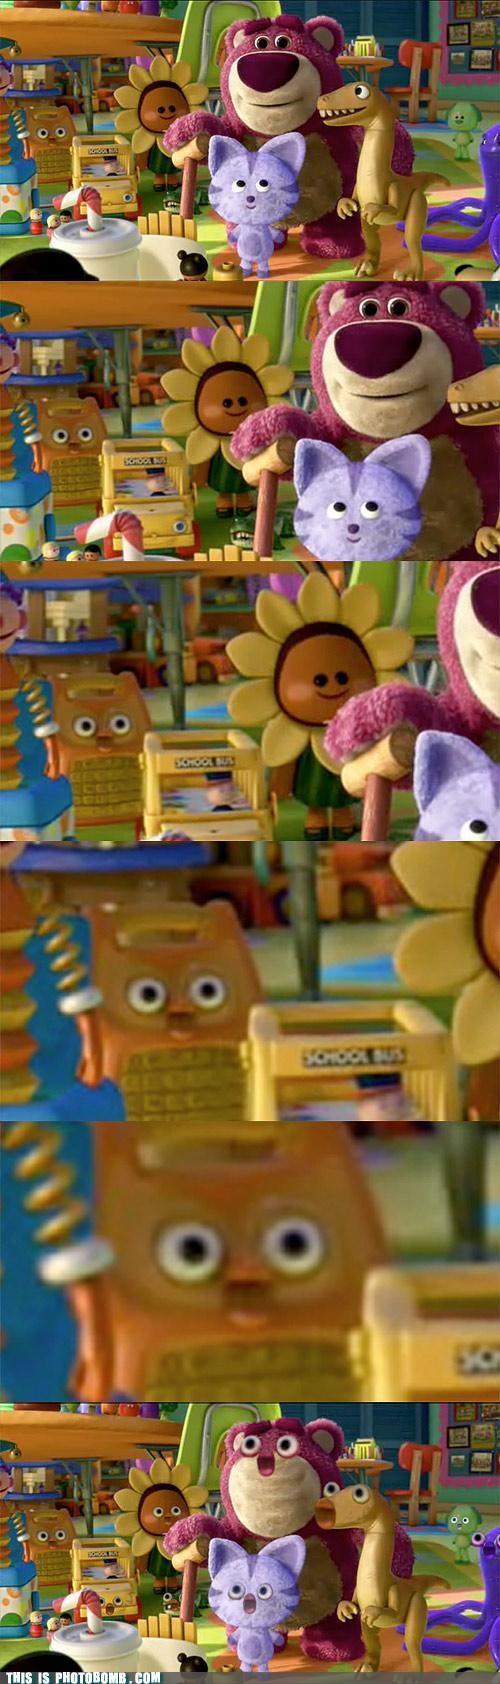 best of week Reframe toy story - 5315826688